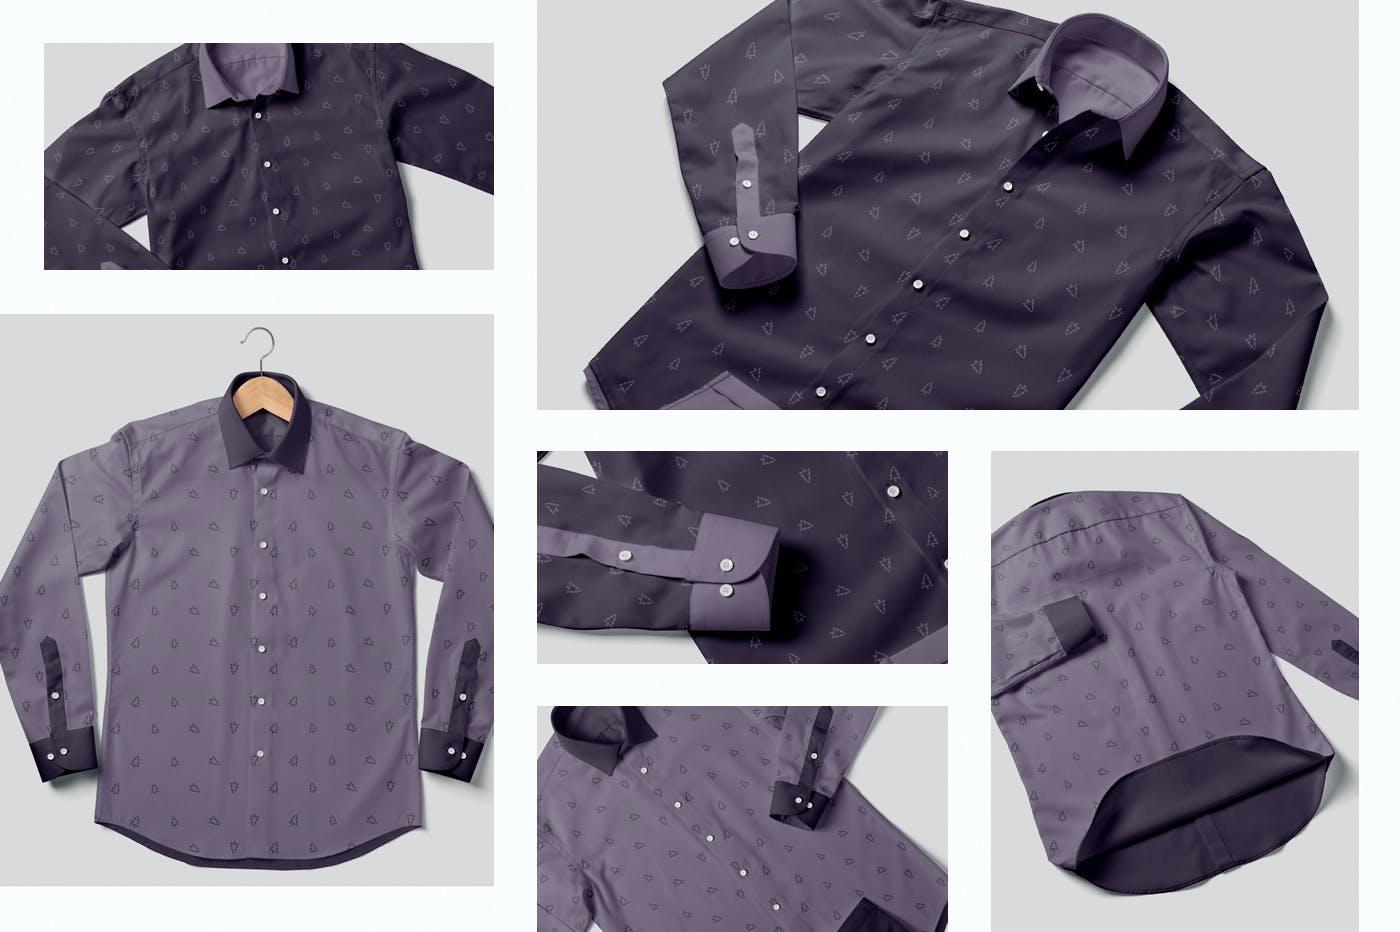 男士纽扣衬衫印花设计PS贴图样机模板 Button Up Shirt For Men Mockups插图1